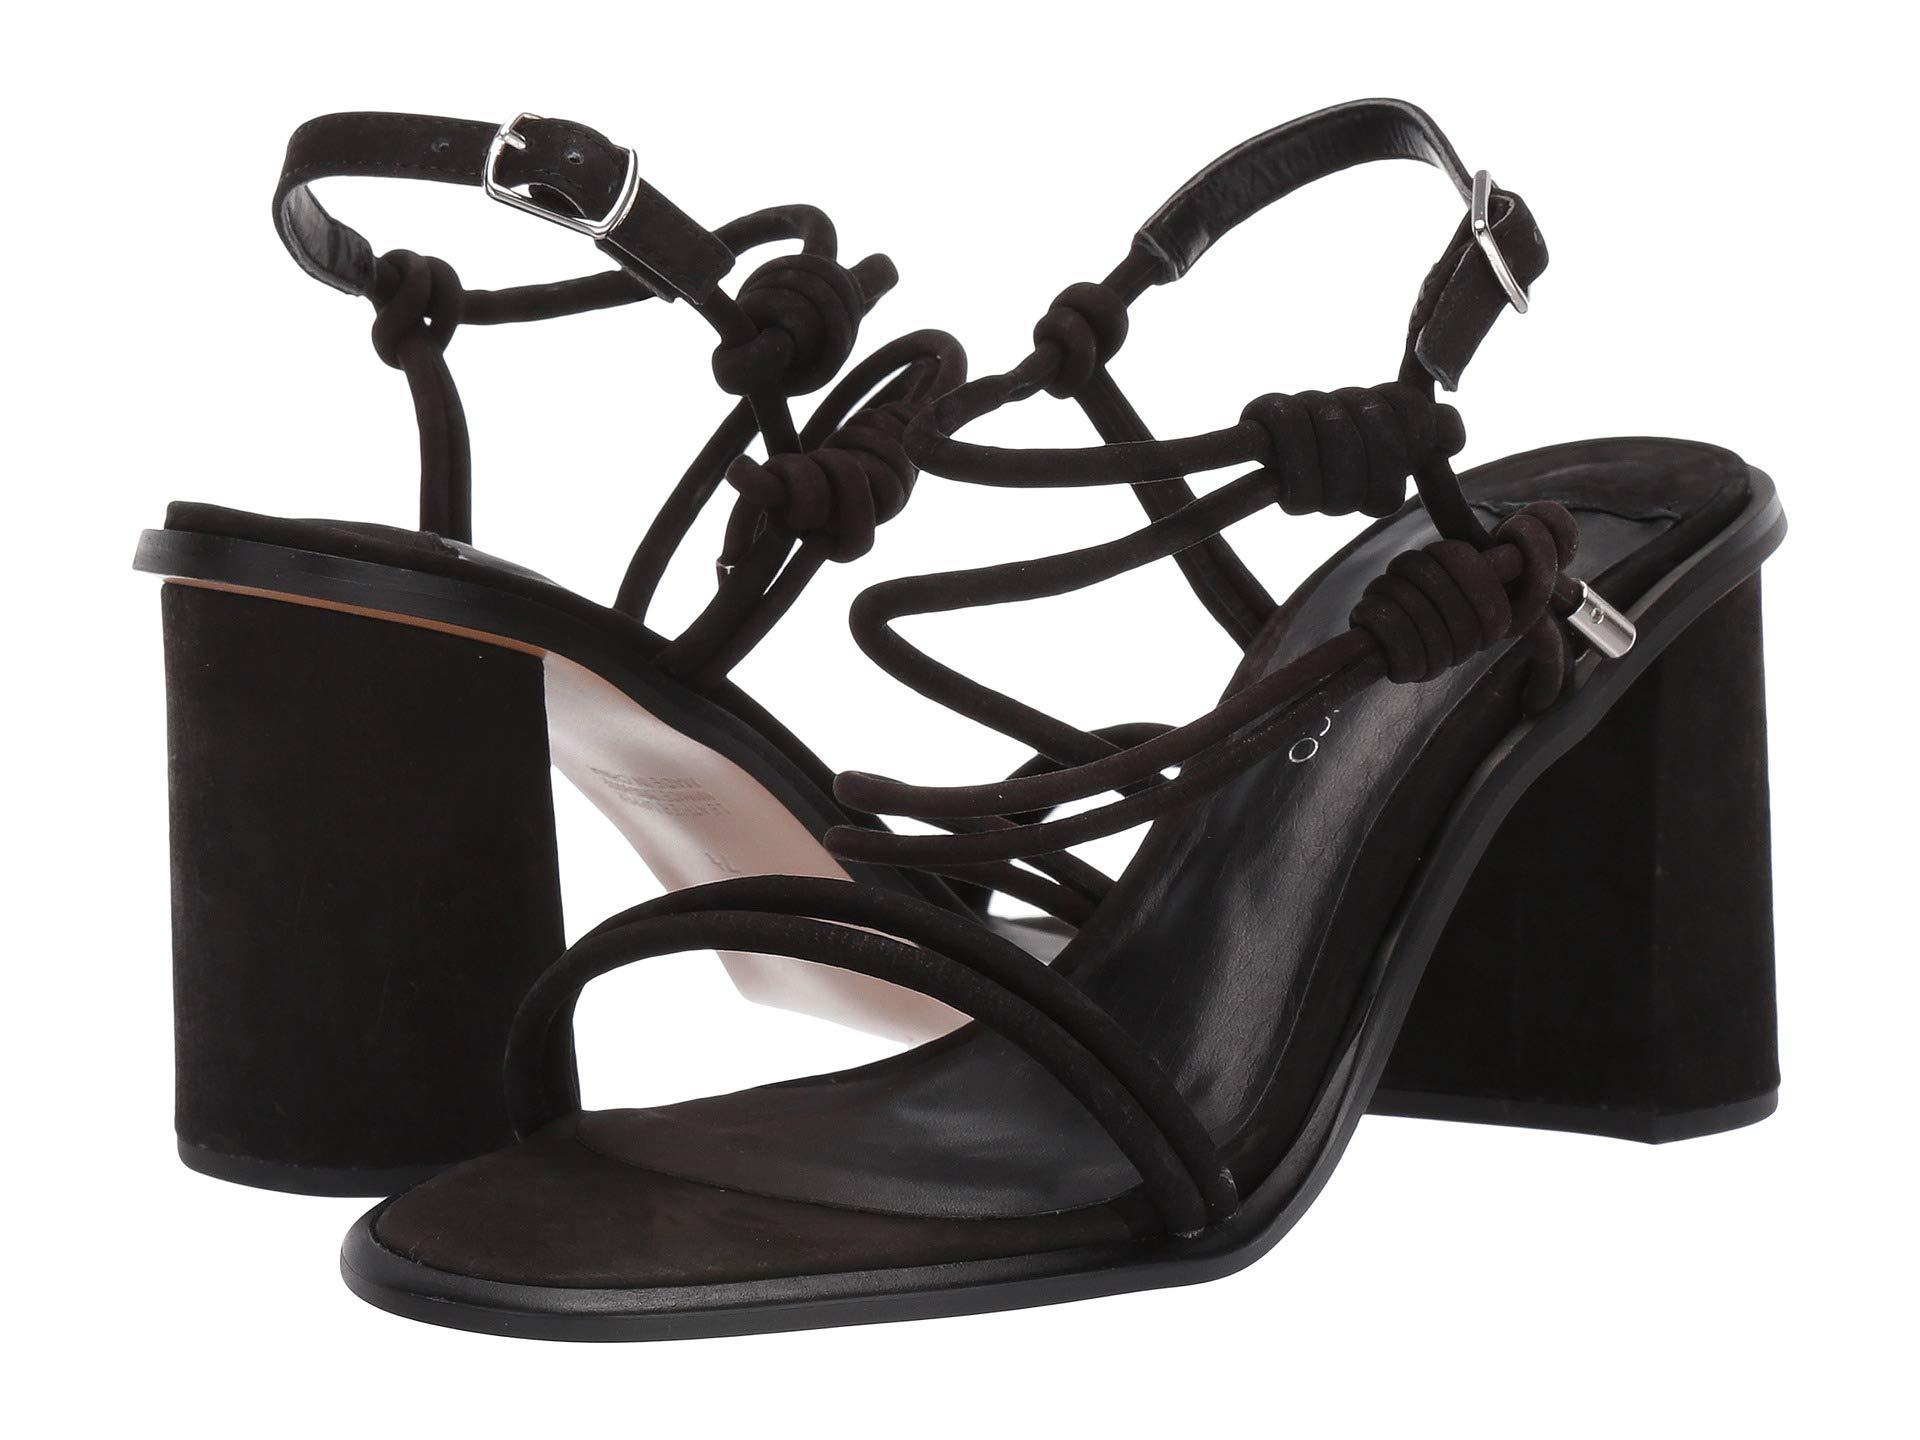 73fe967dc05 Lyst - Tony Bianco Cruze (caramel Phoenix) Women s Shoes in Black